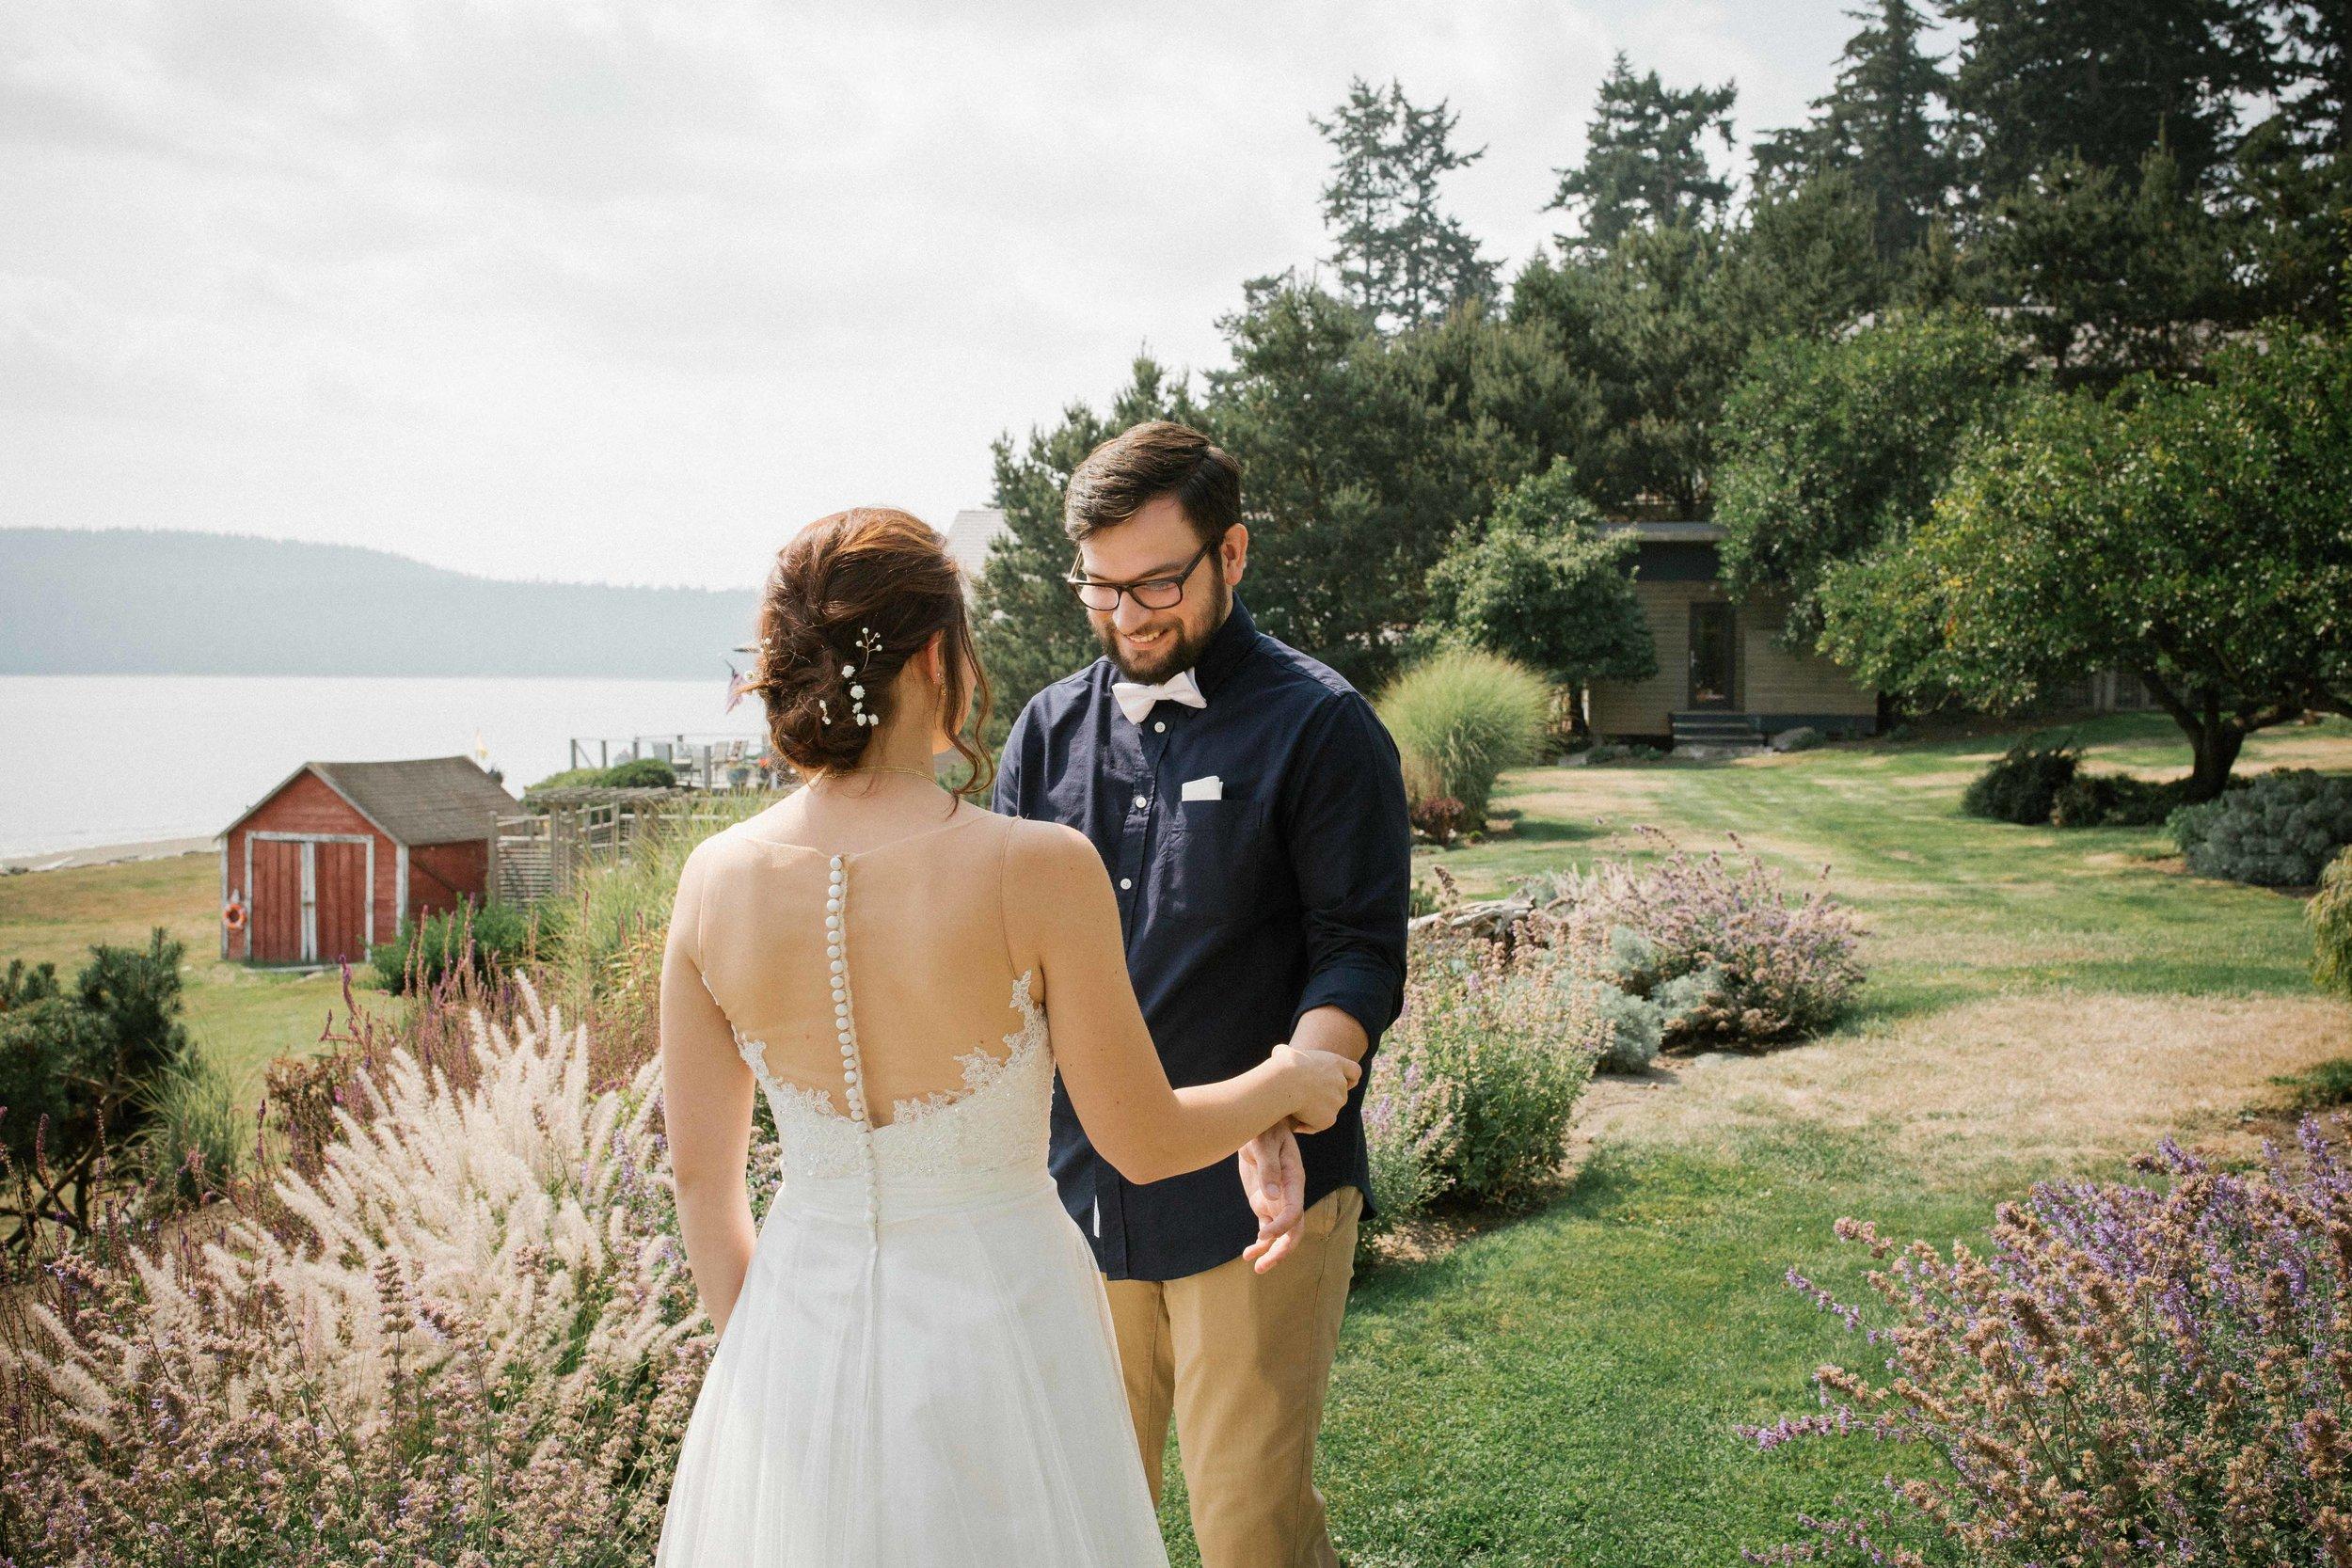 deception-pass-wedding-16.jpg